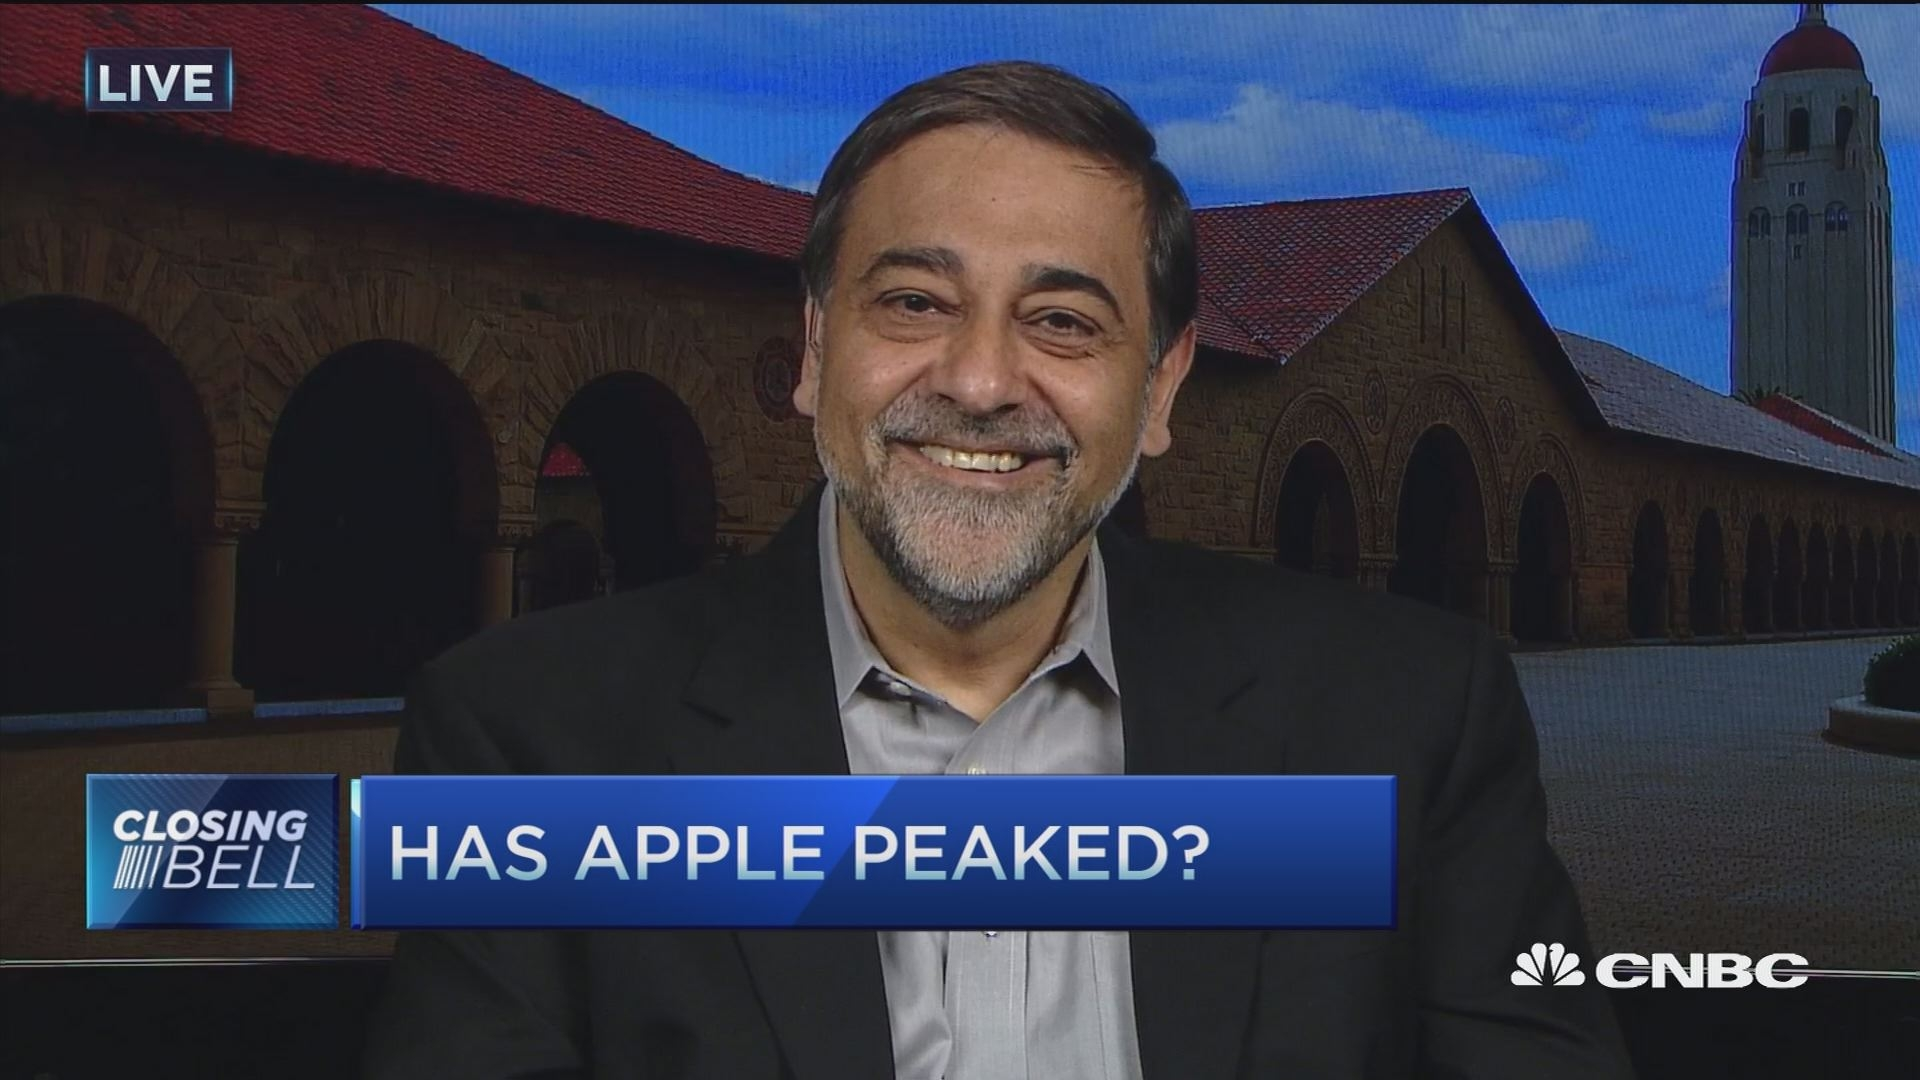 Apple lacks innovation, it copies: Expert